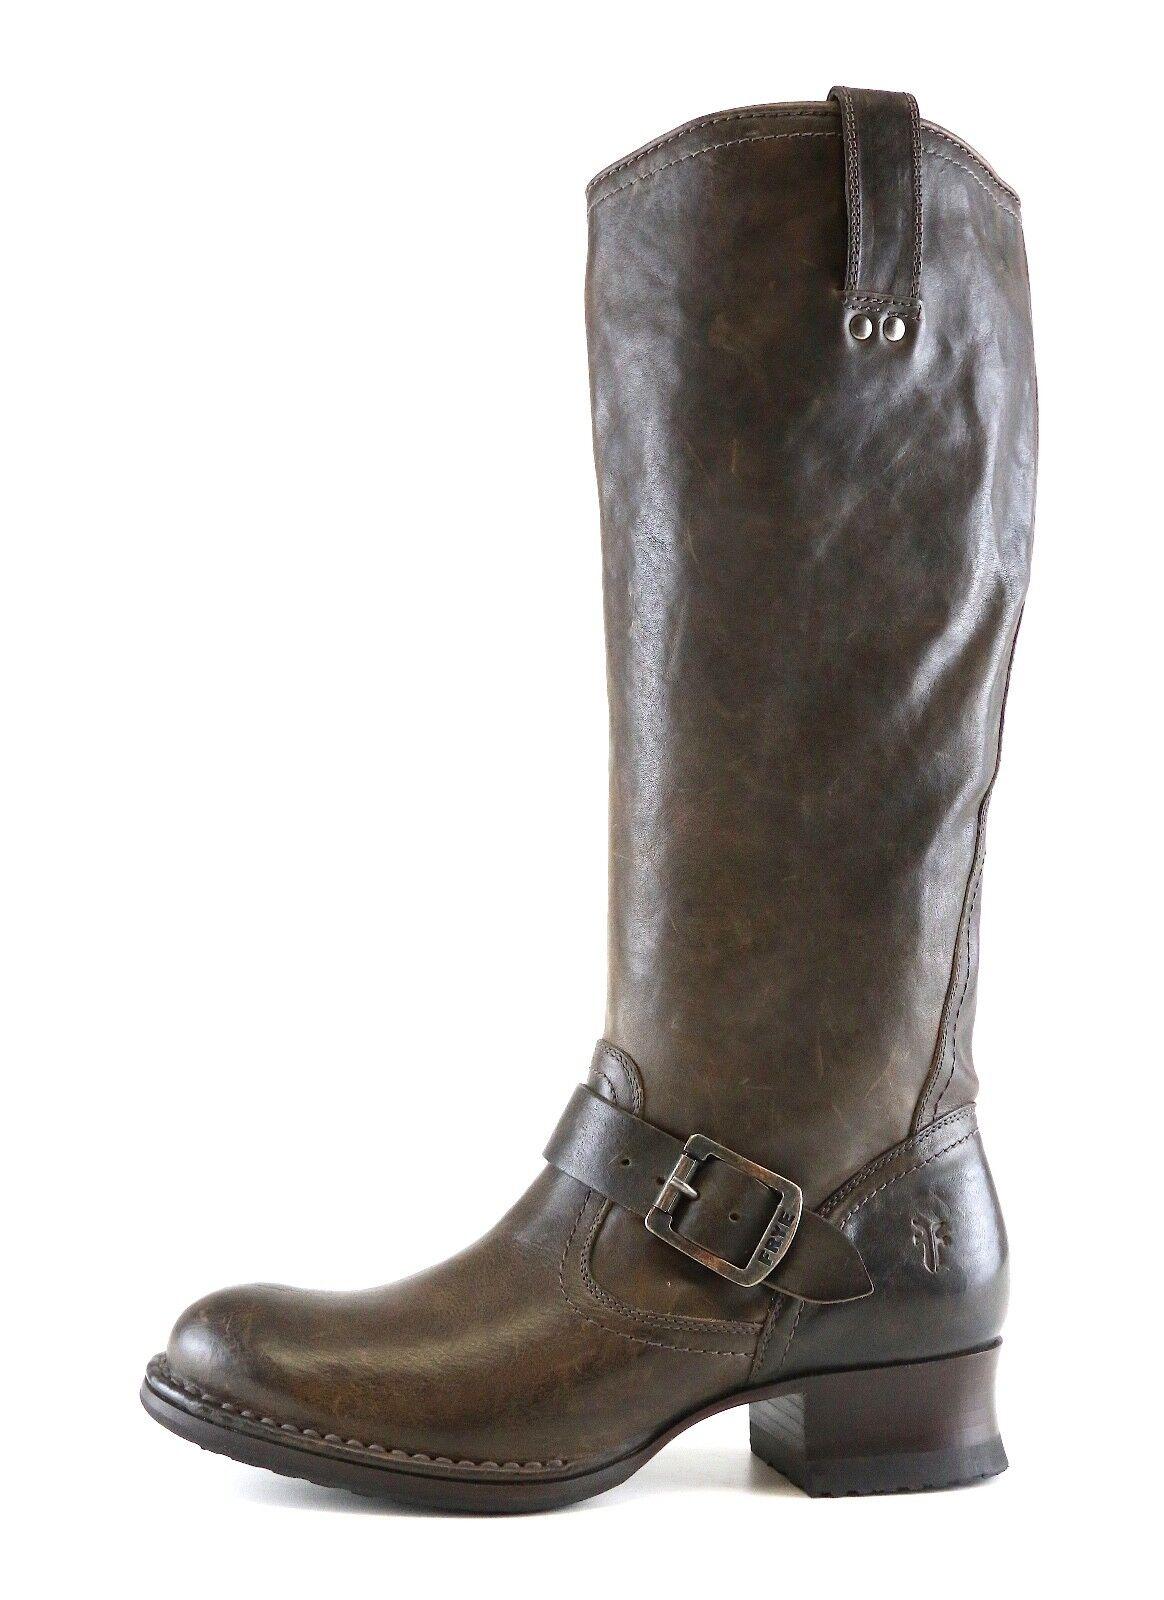 FRYE Martina Engineer Leather Round Toe Leather Engineer Stiefel Dark braun damen Sz 6 B 6707  c5af4d